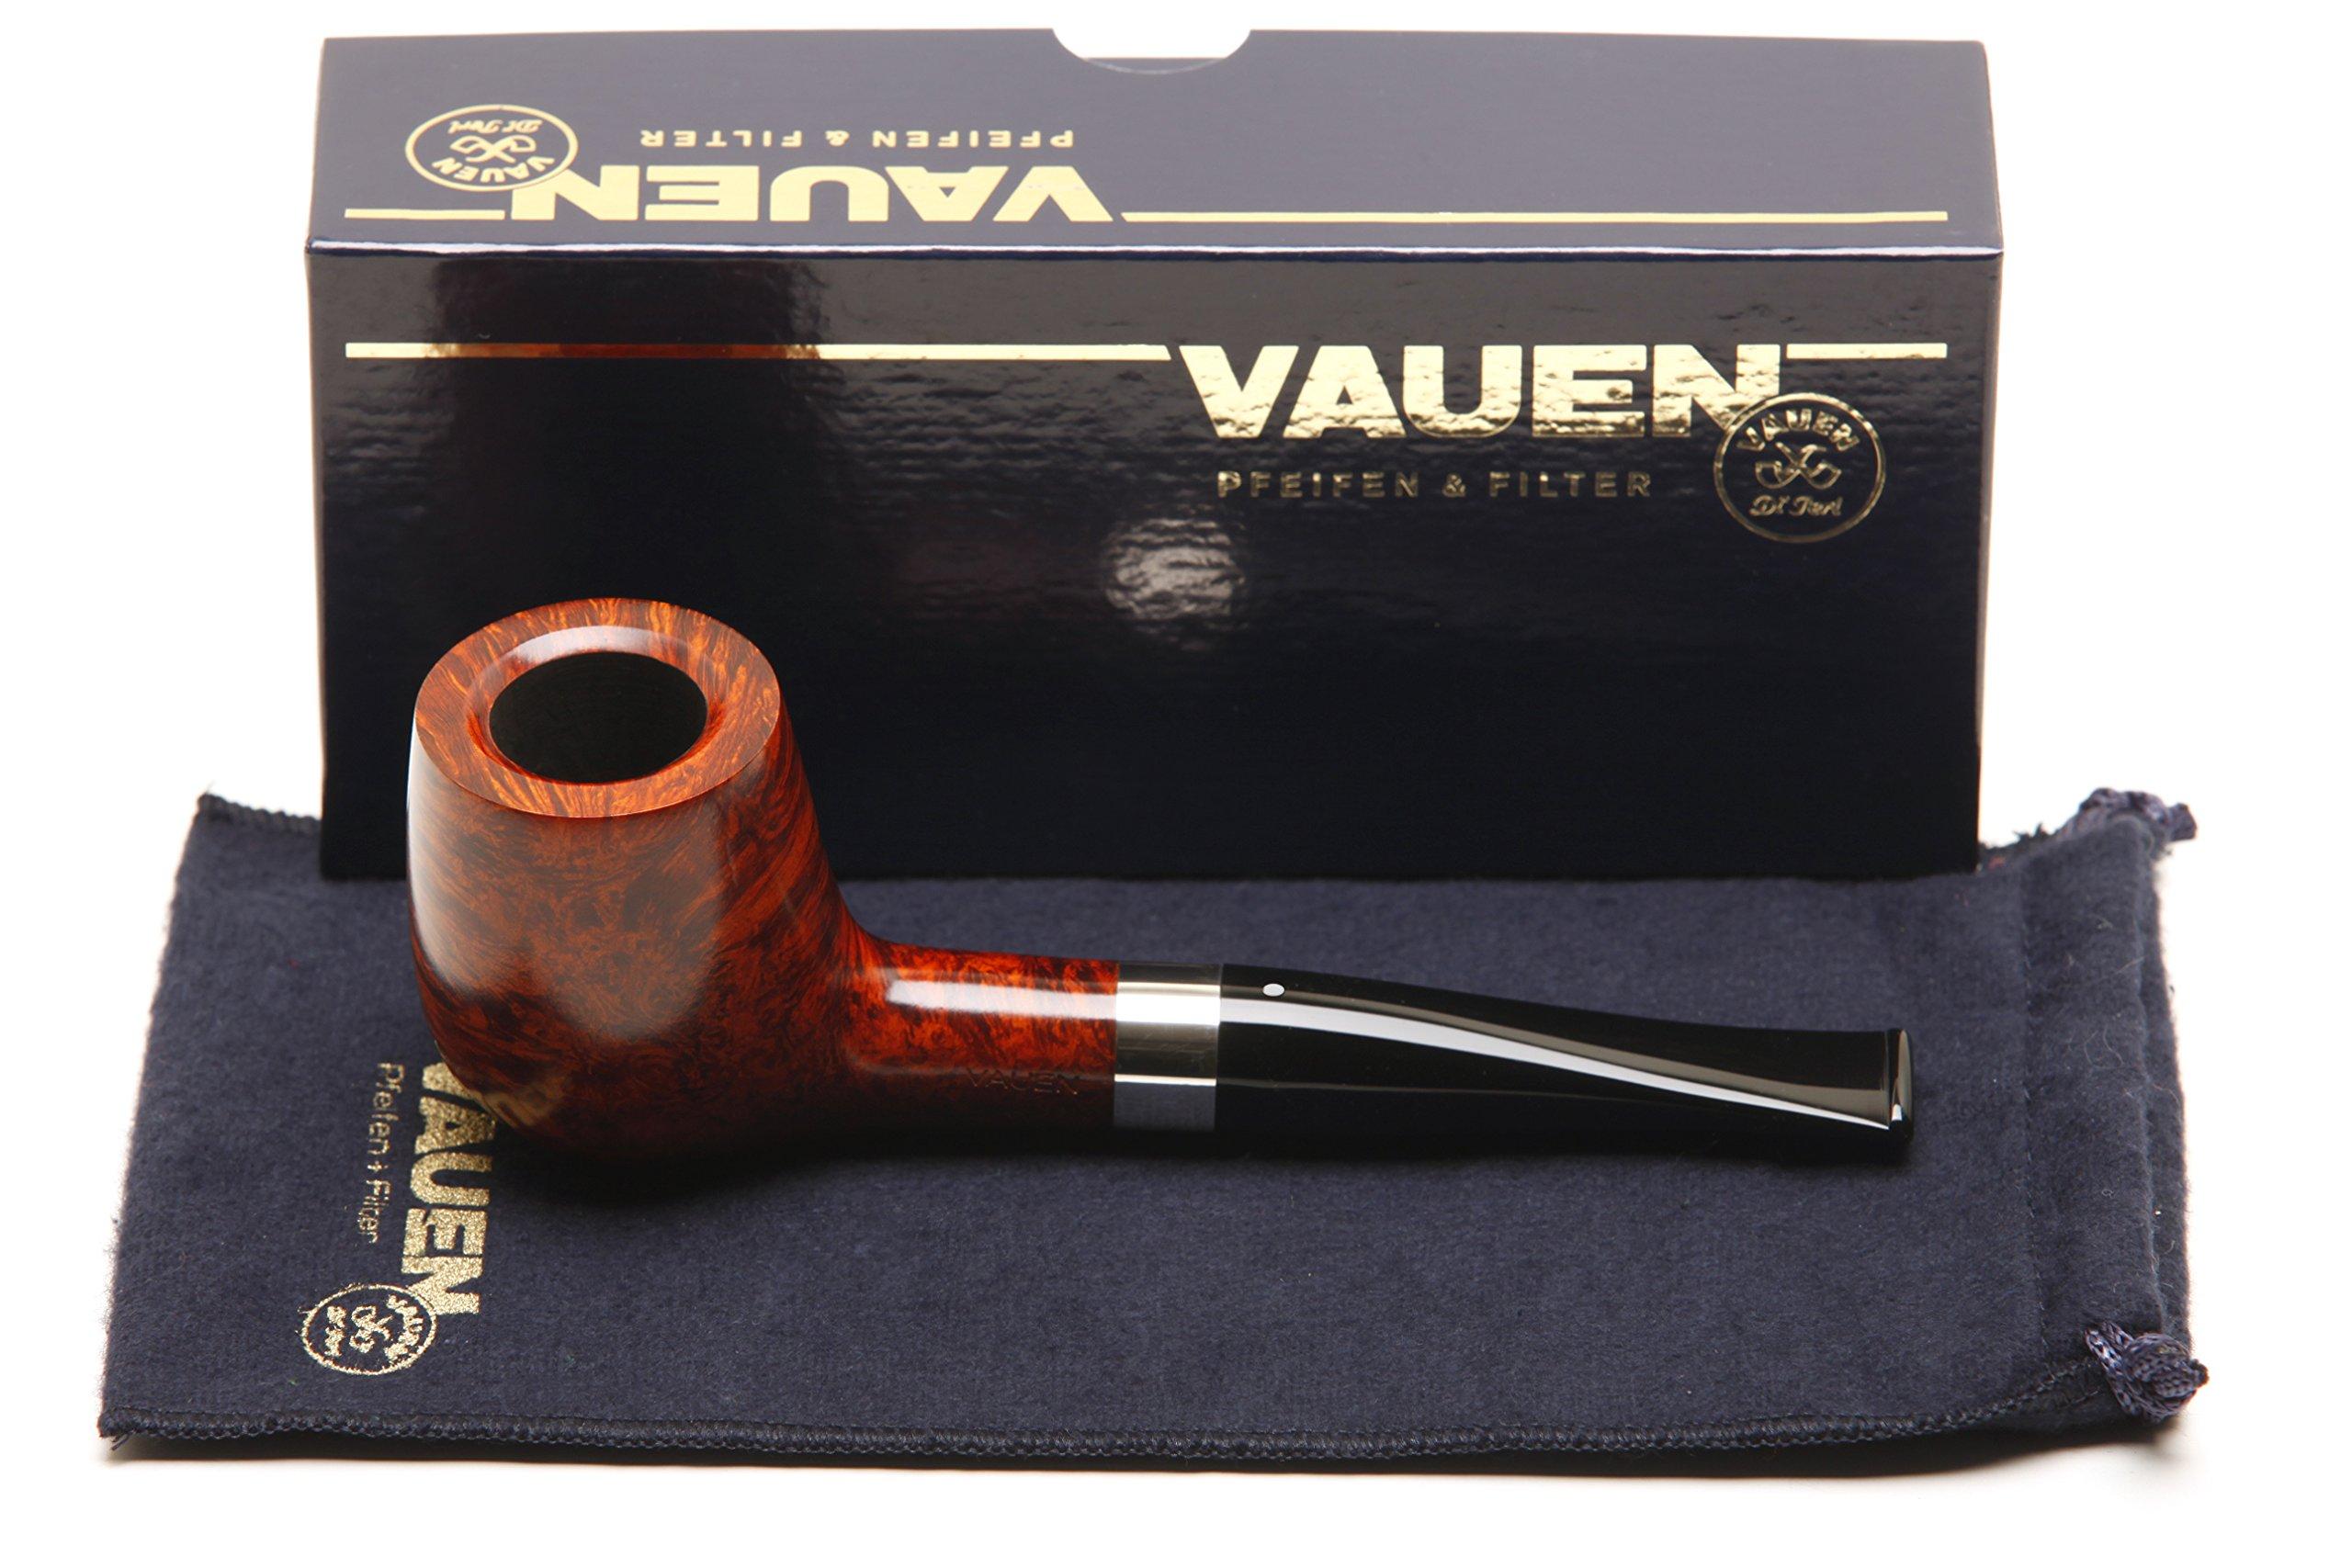 Vauen Giant G 147 Tobacco Pipe